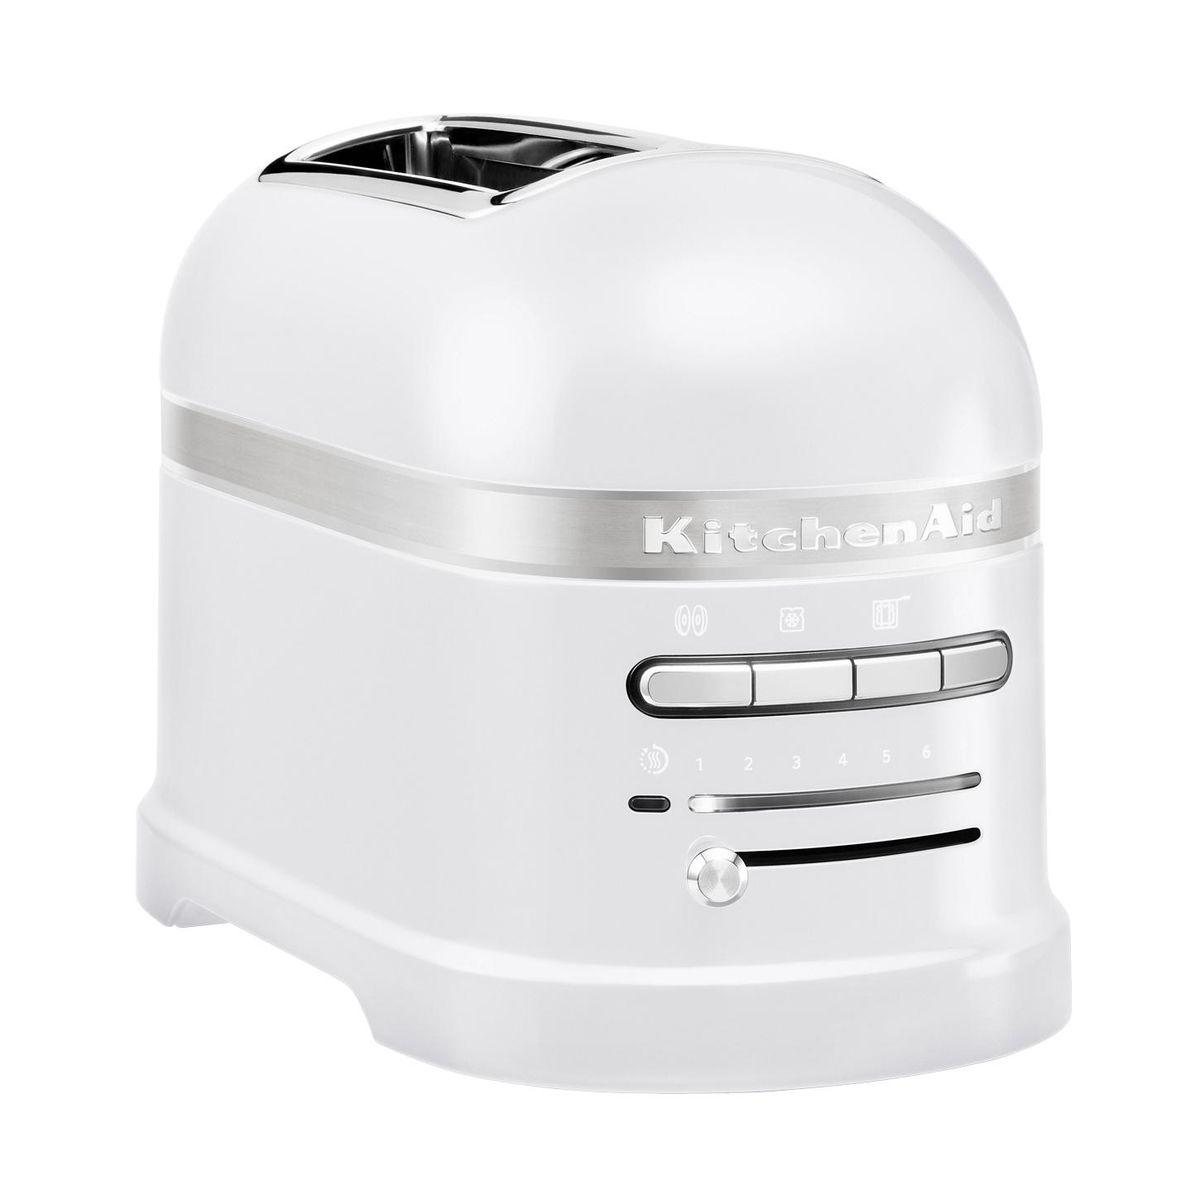 artisan 5kmt2204 toaster 2 slices kitchenaid. Black Bedroom Furniture Sets. Home Design Ideas